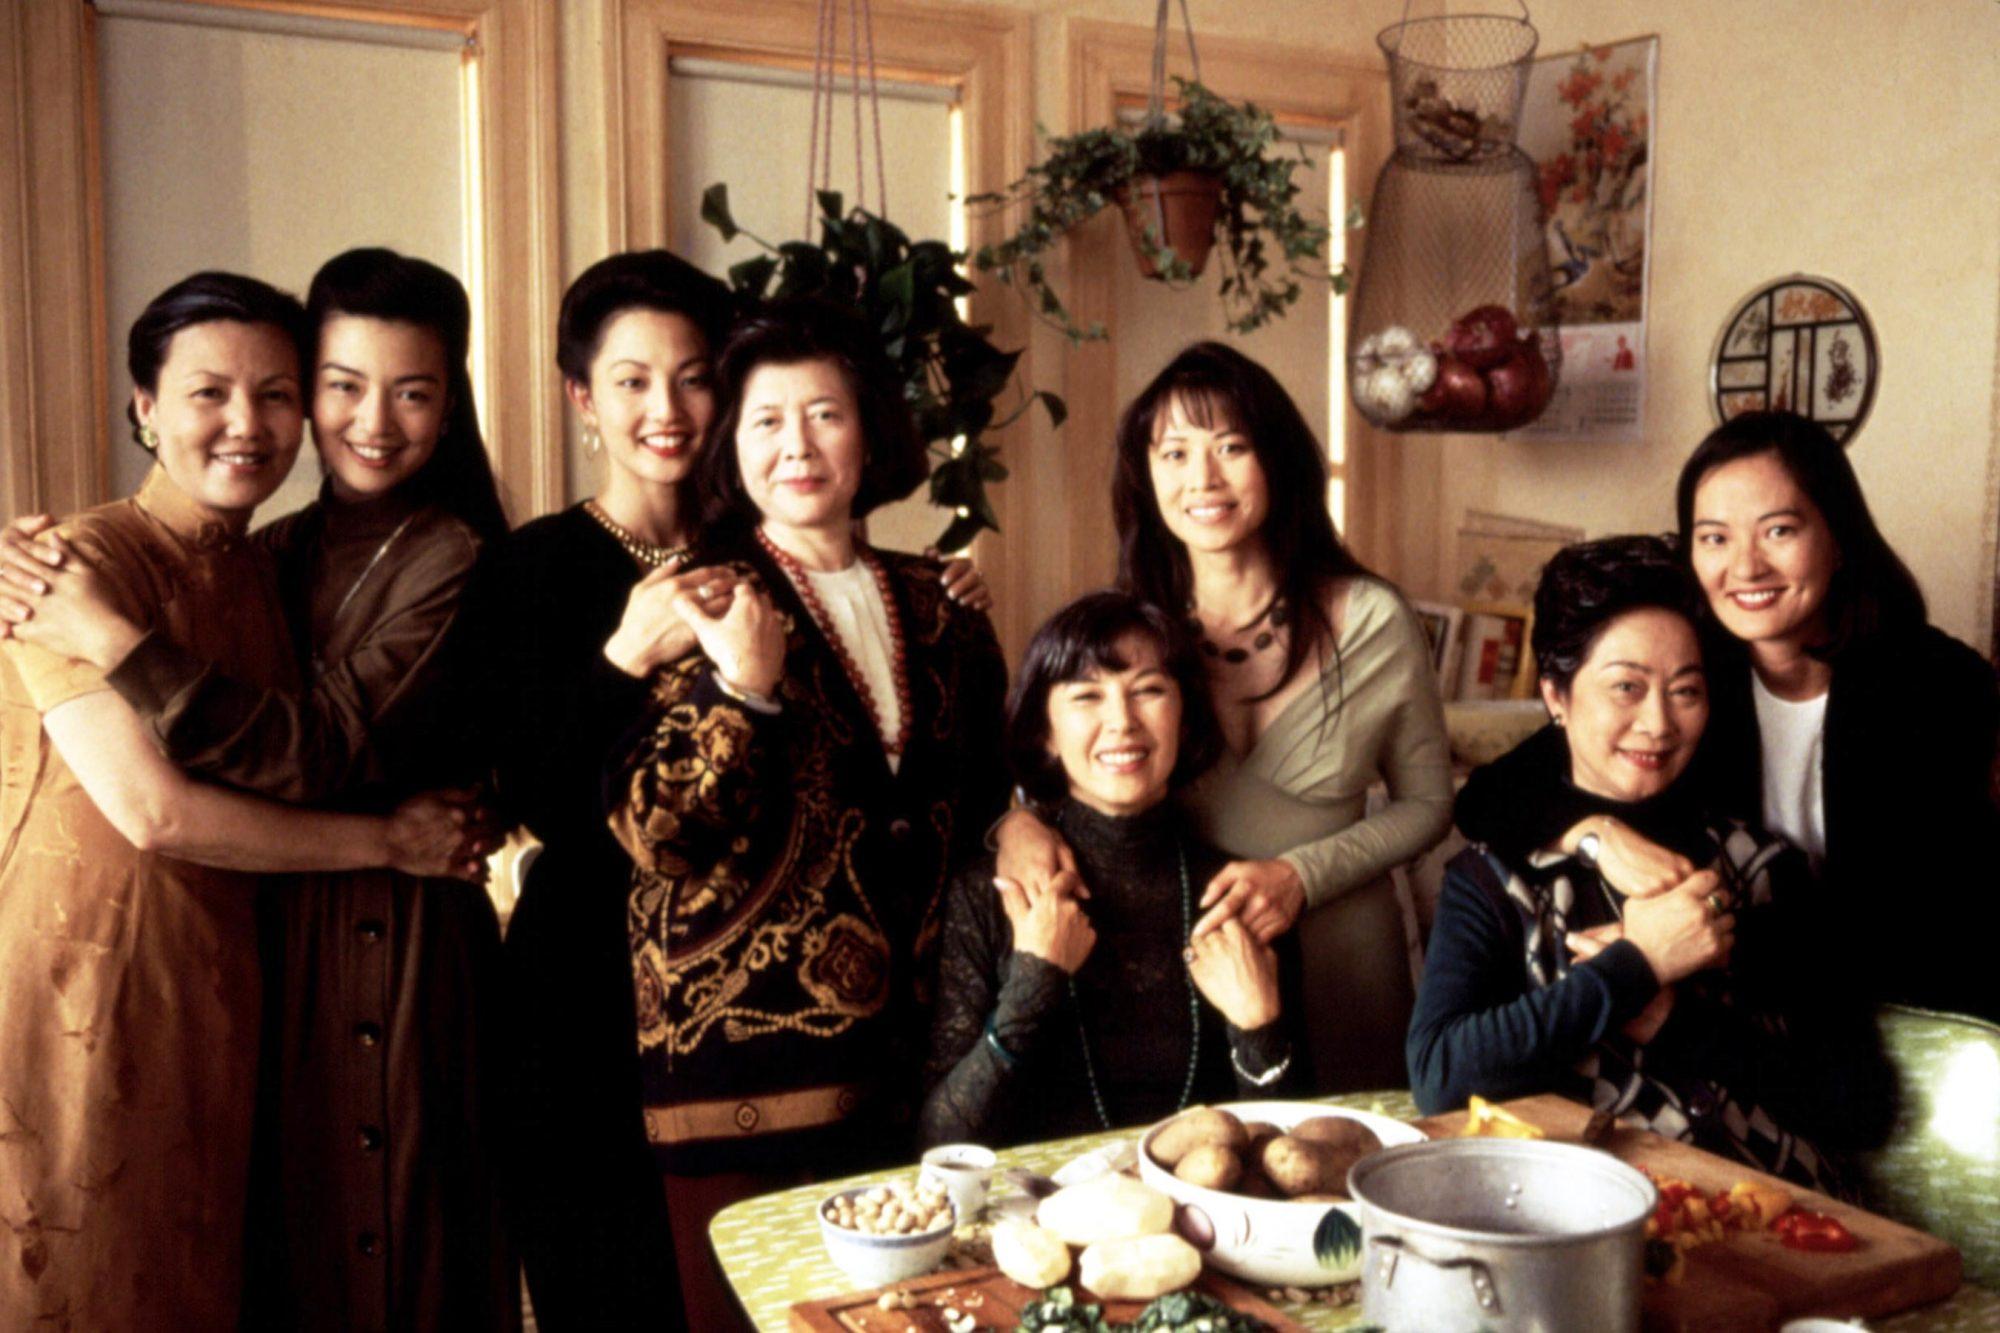 THE JOY LUCK CLUB, Kieu Chinh, Ming-Na Wen, Tamlyn Tomita, Tsai Chin, France Nuyen, Lauren Tom, Lisa